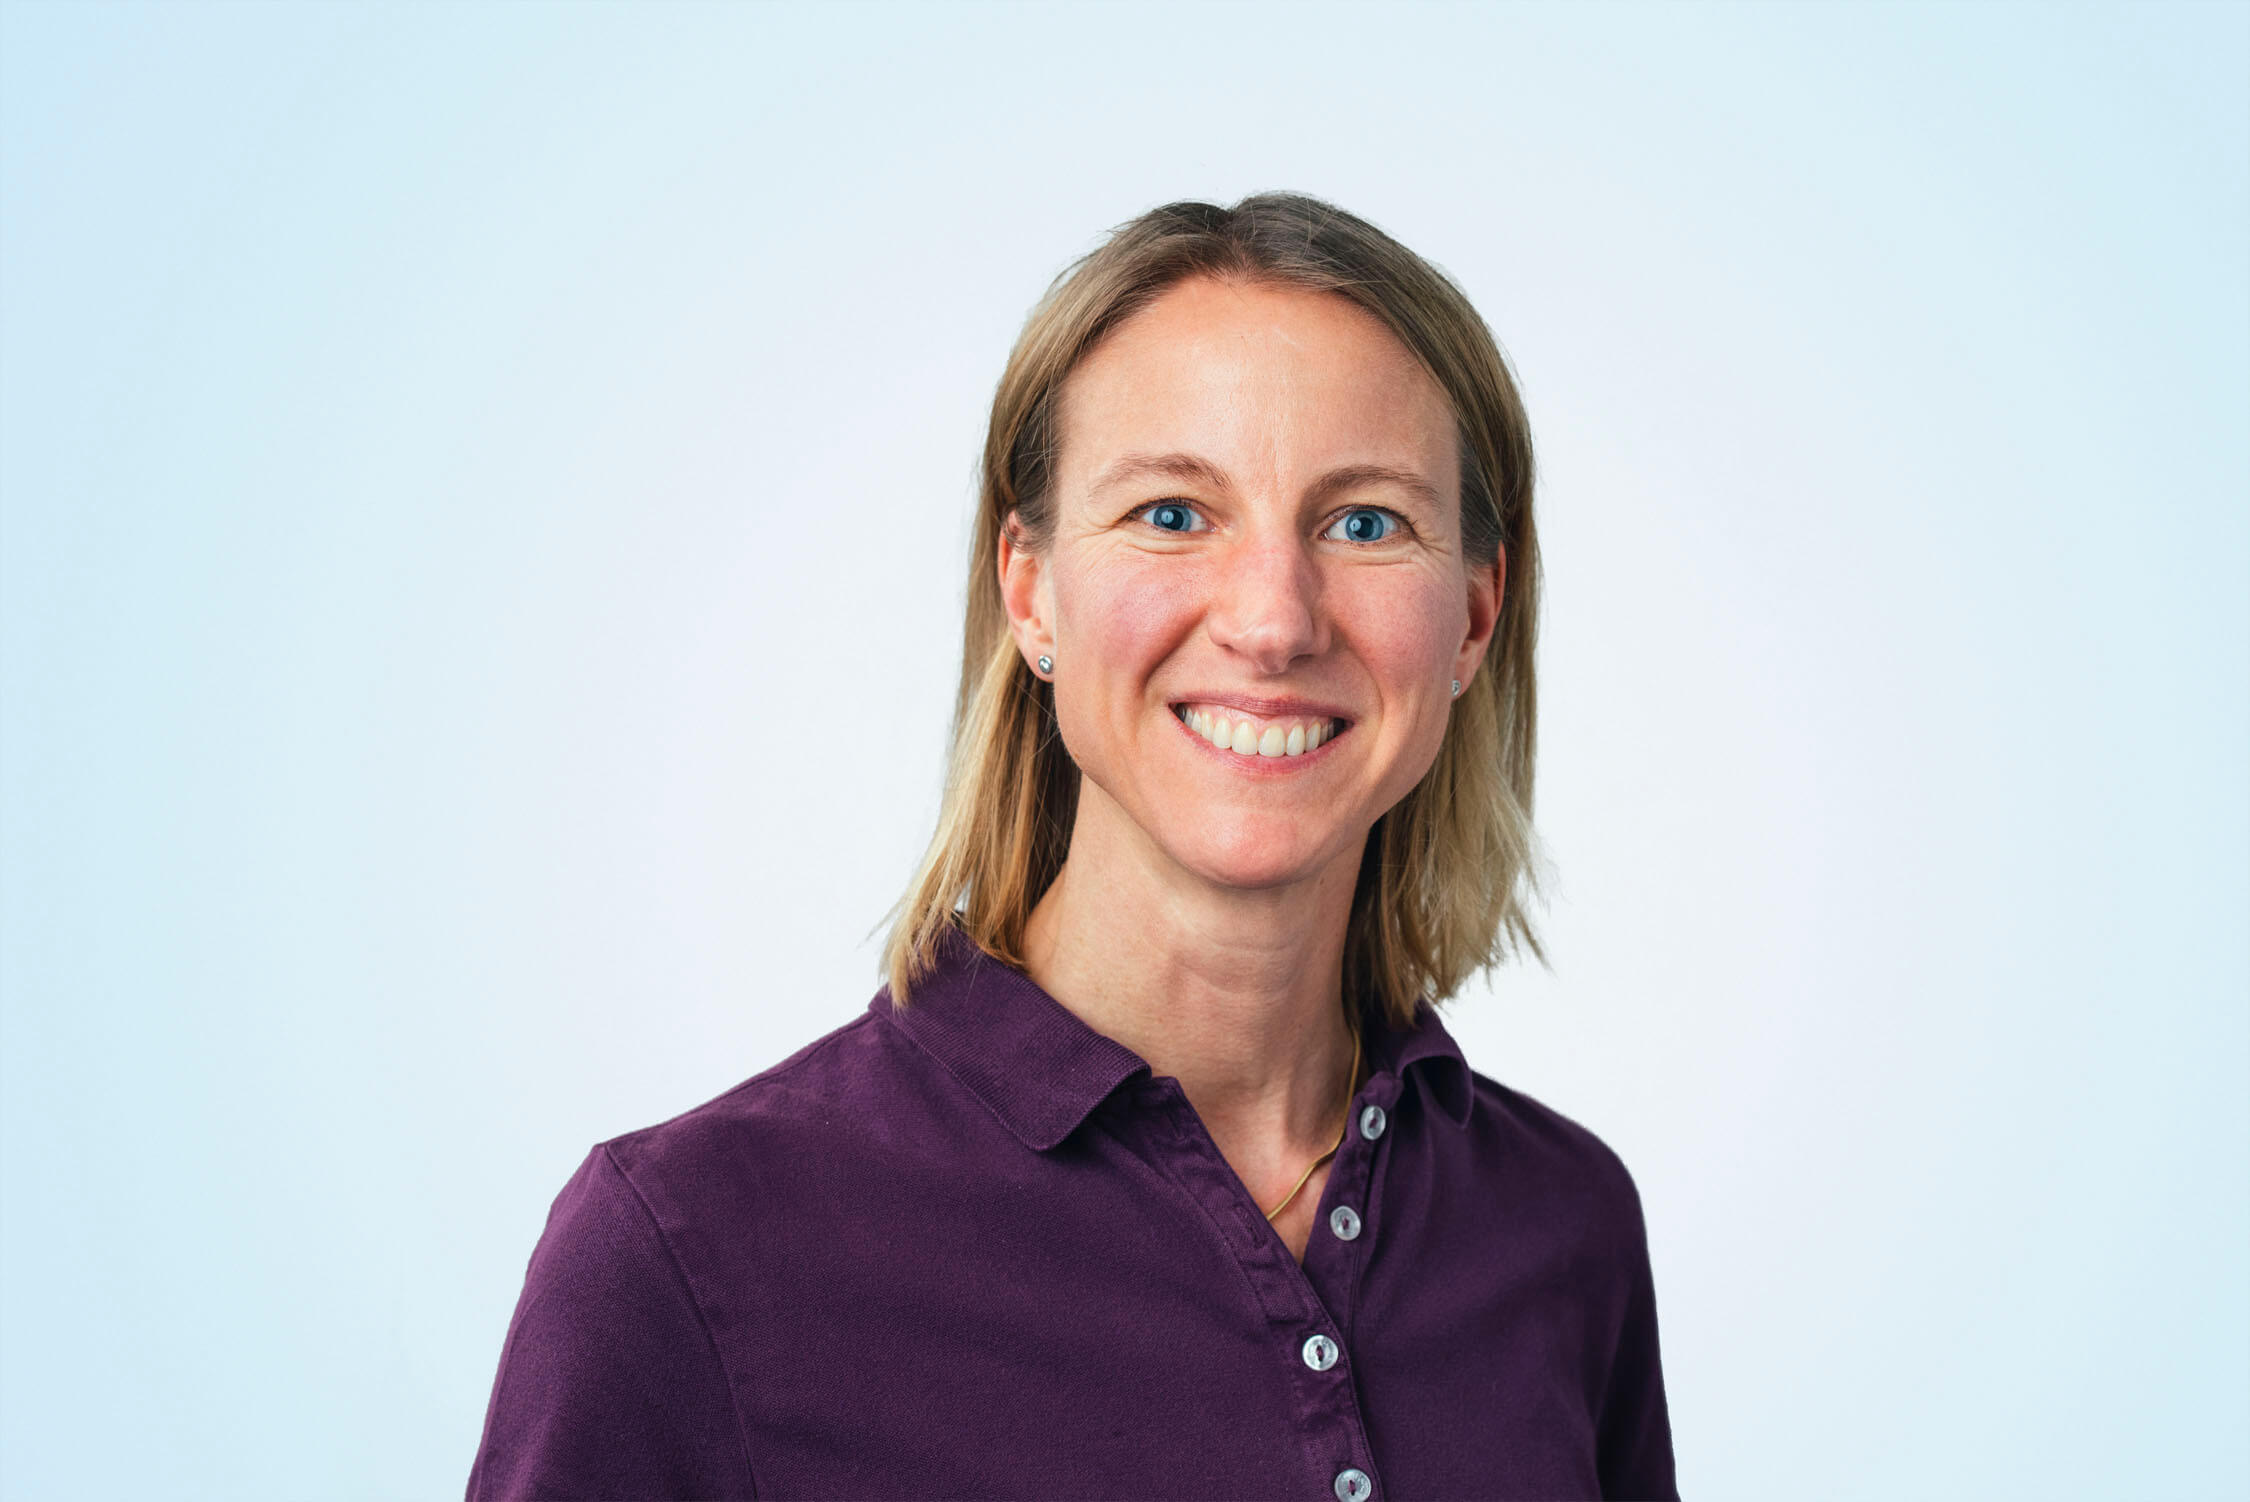 Dr. Jeannette Förster